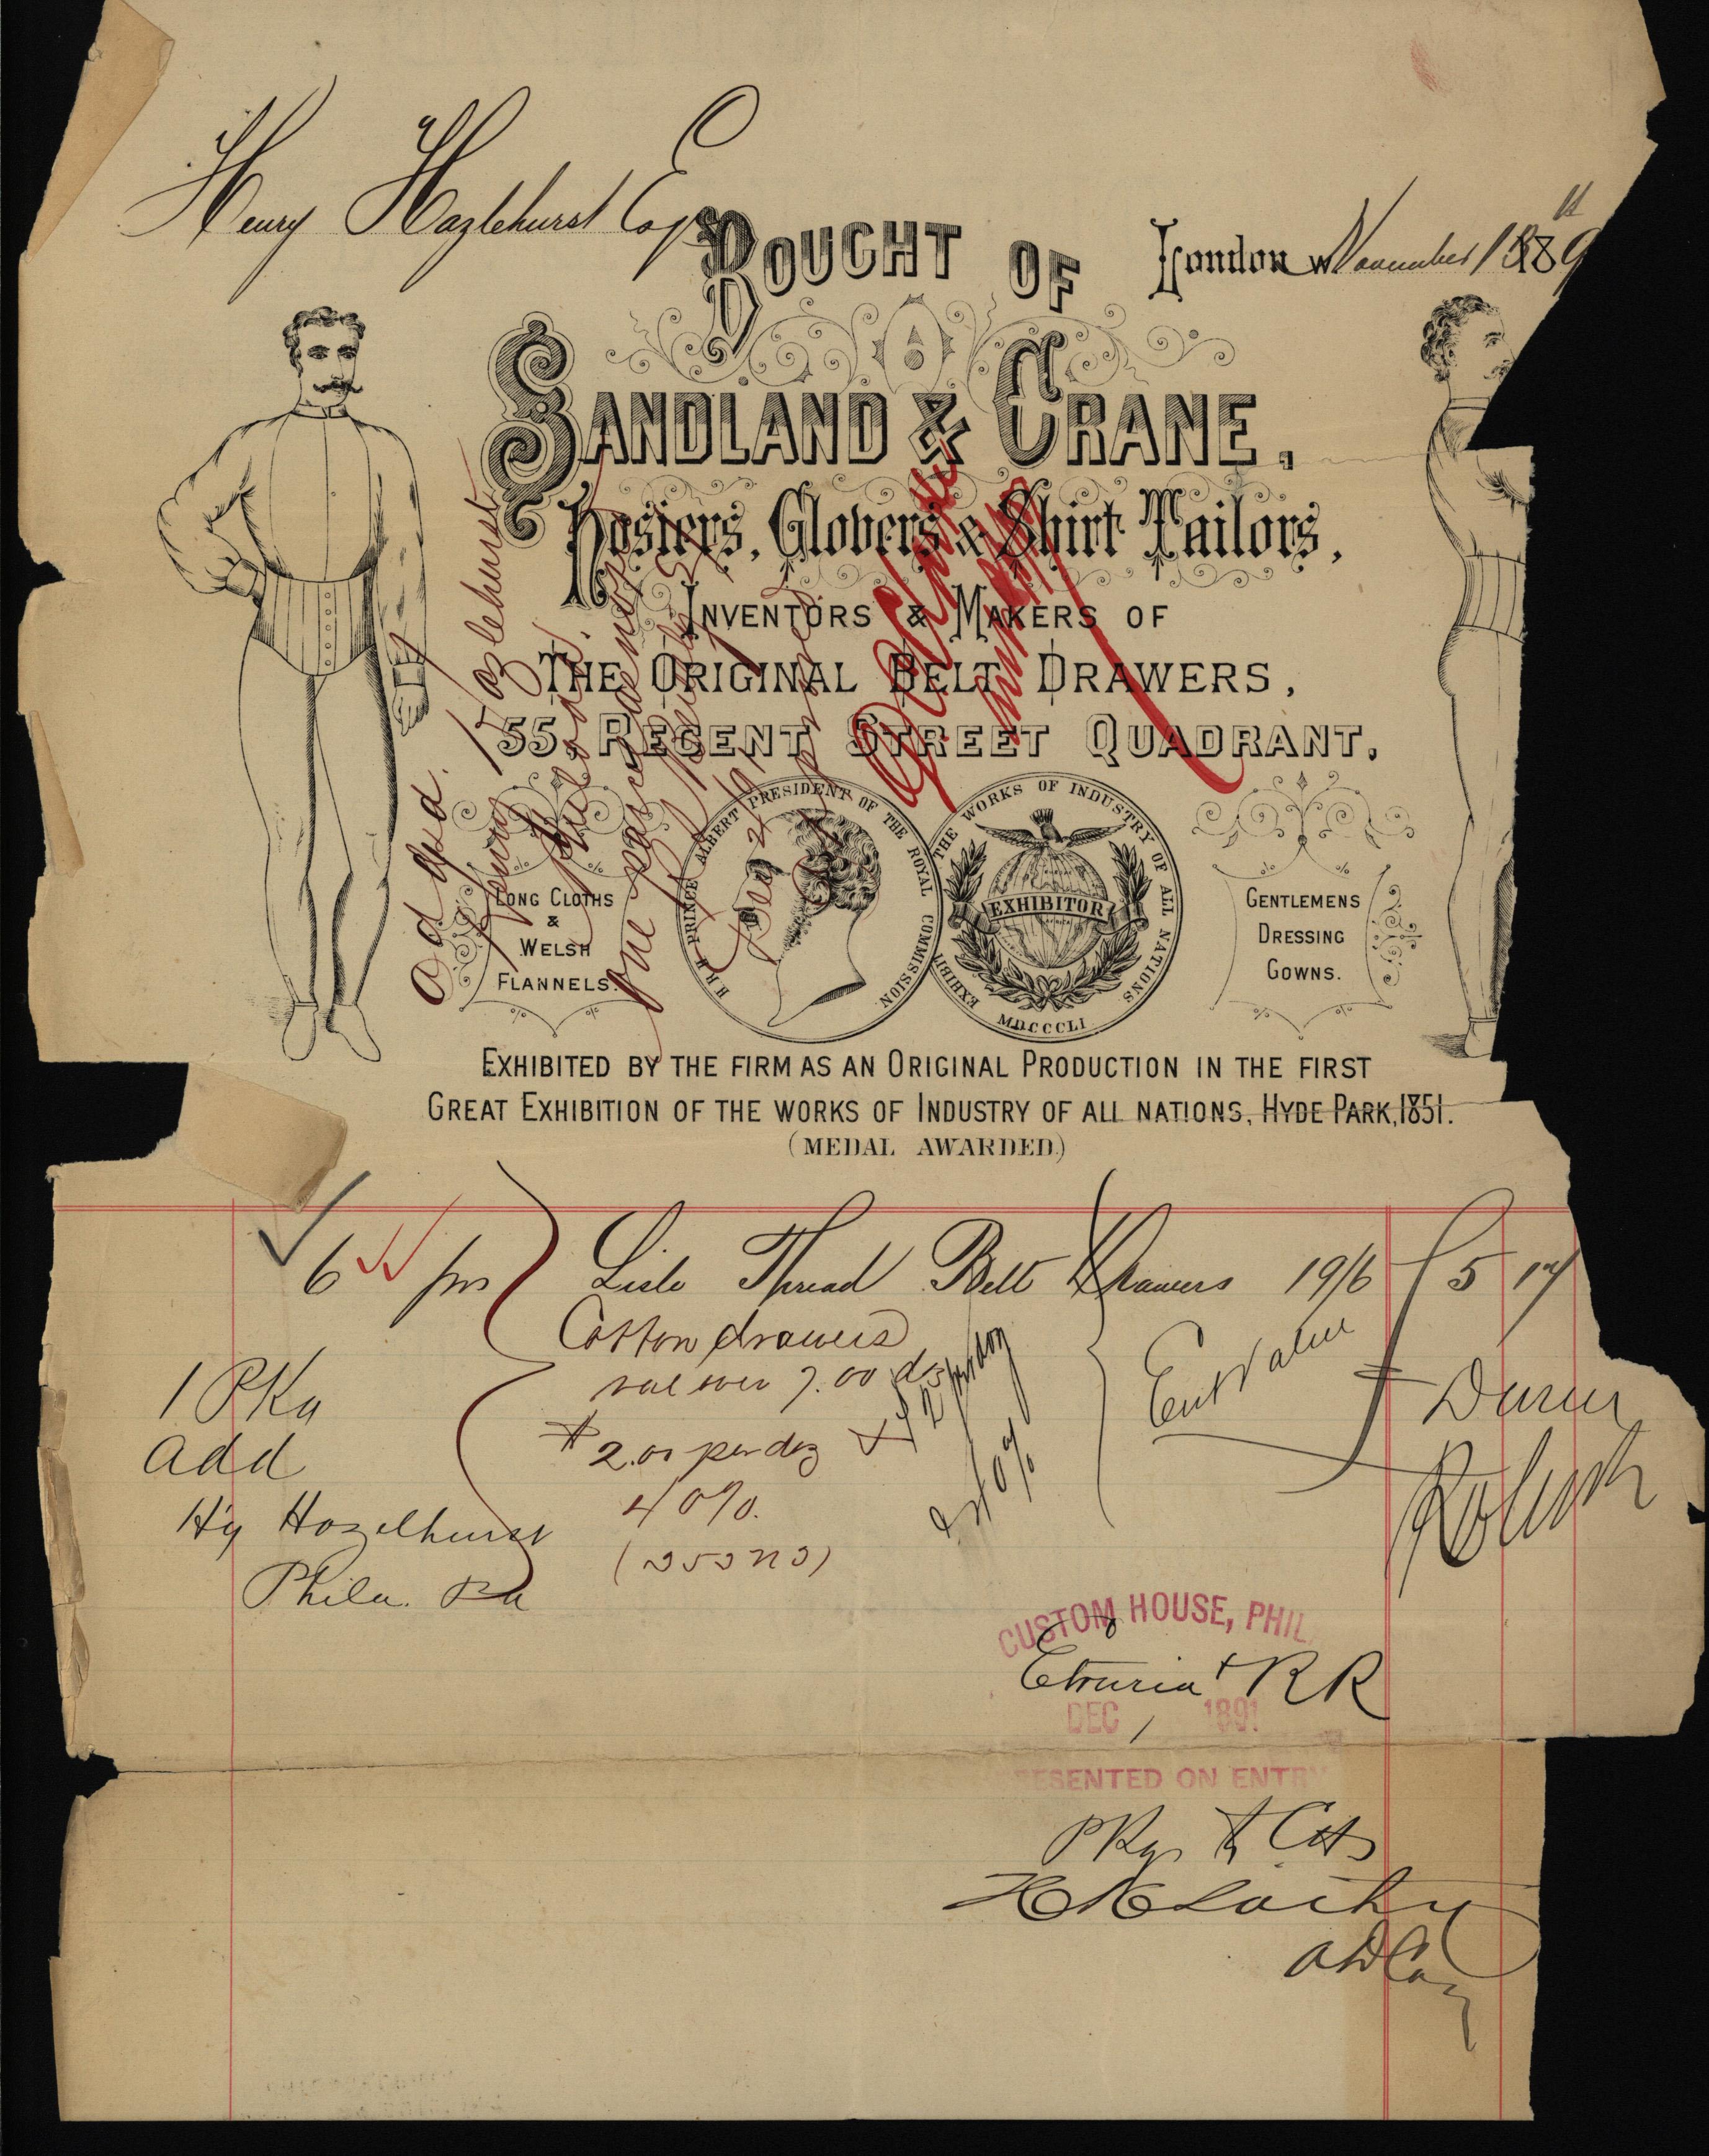 Invoice for belt drawers, Sandland & Crane, 1891